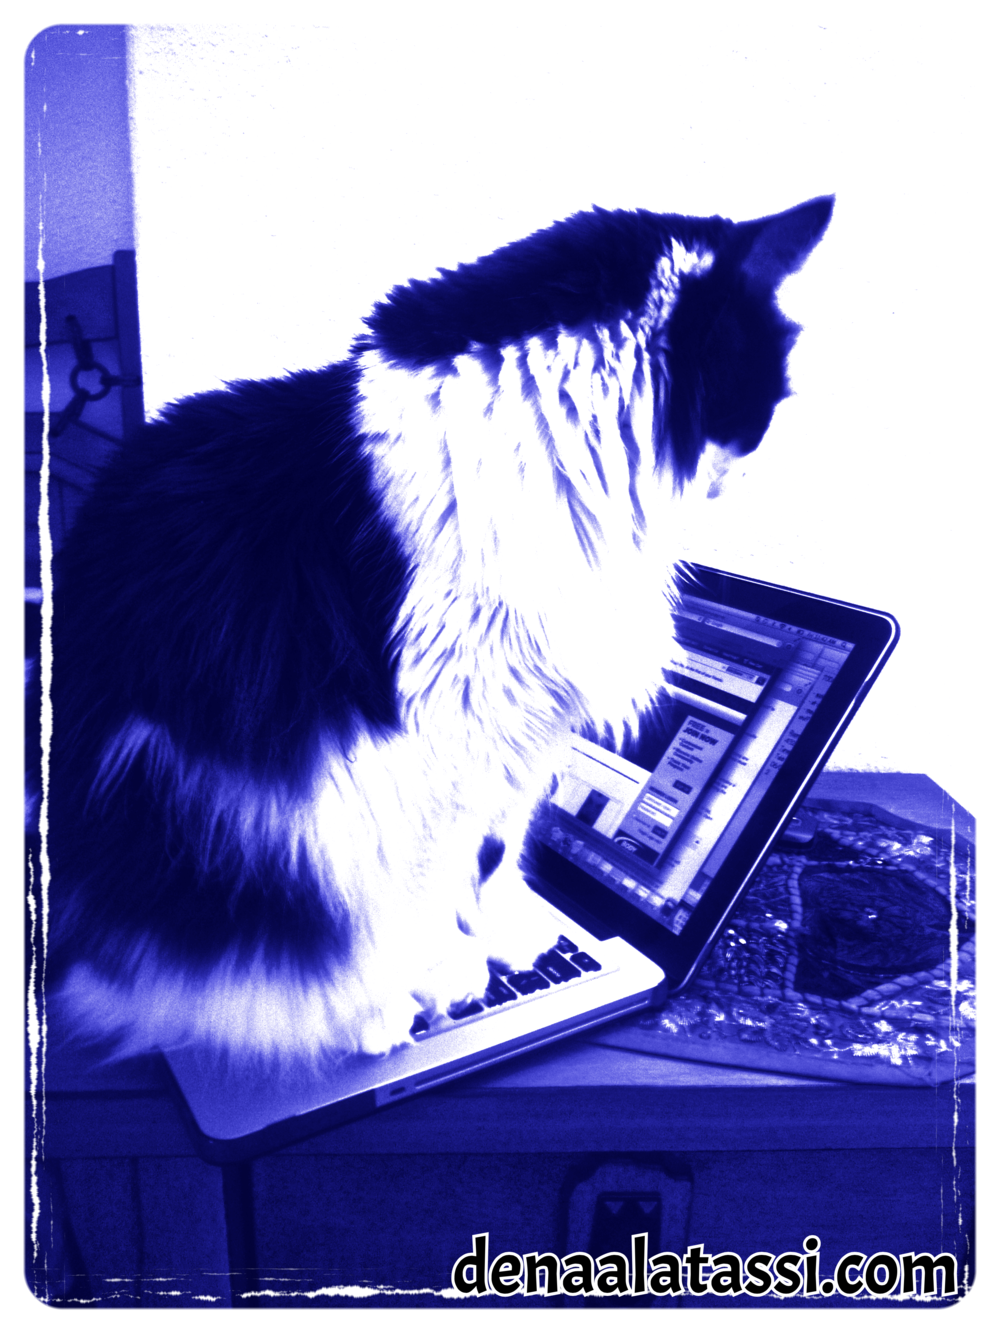 Suzie Diligently Monitoring the Computer! ~ Riyadh, 2012